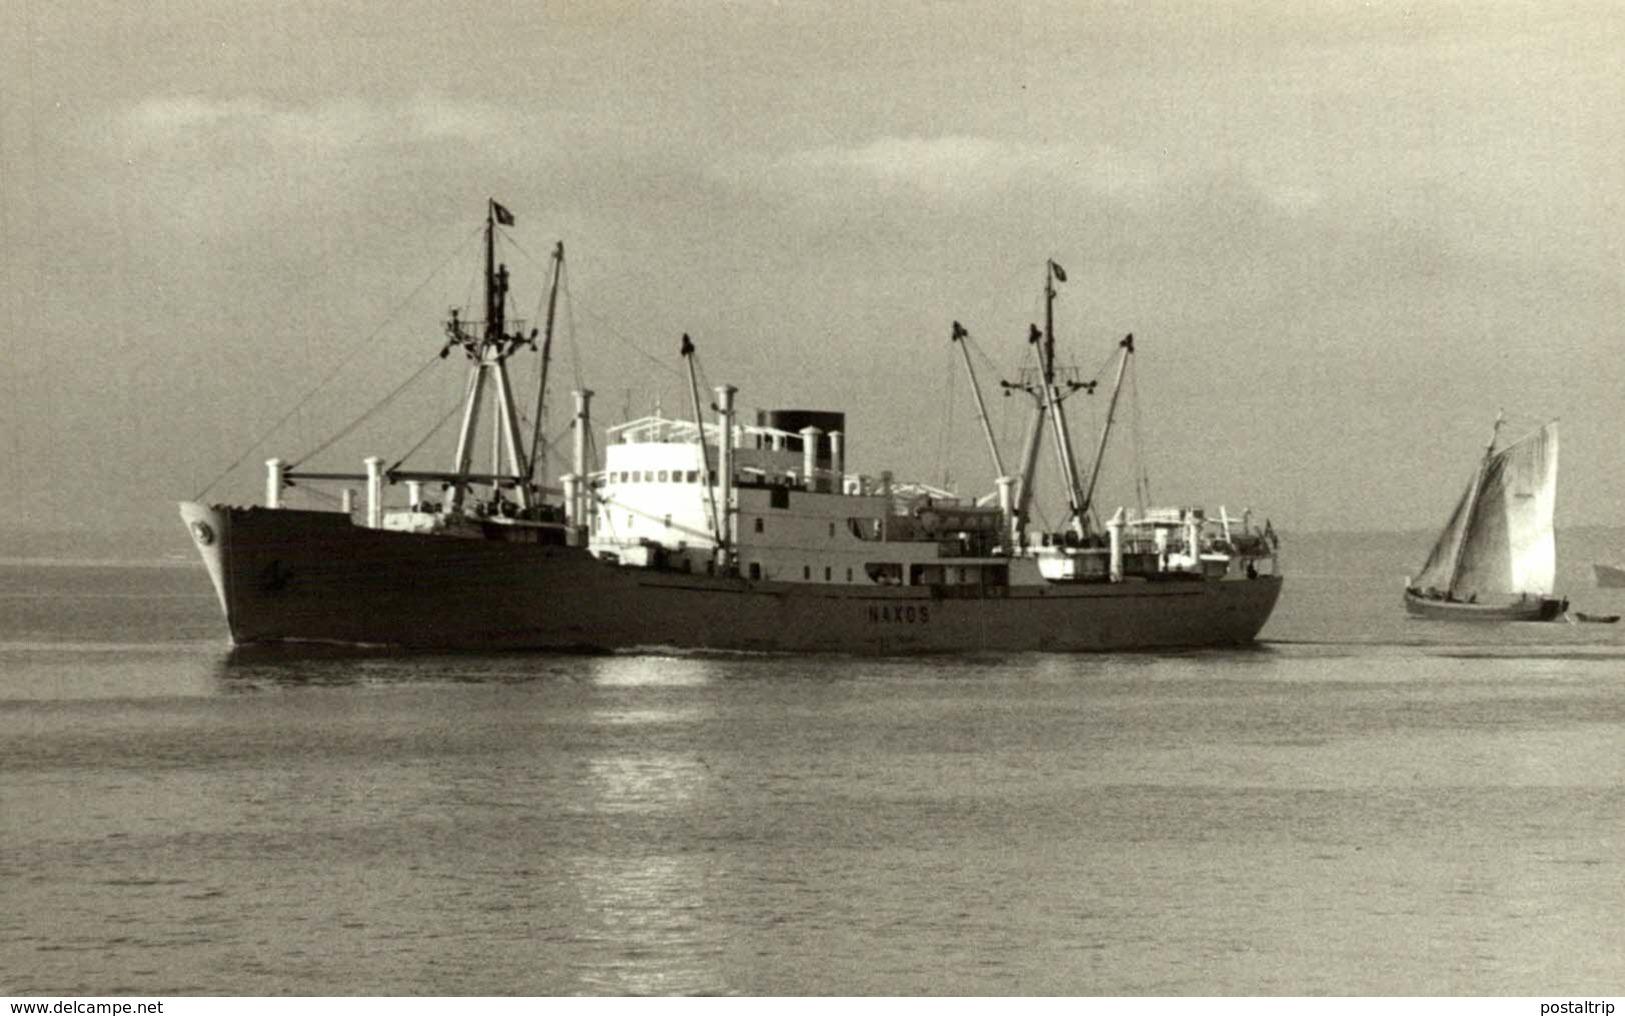 NAXOS 13,5 X 9 Cm  BARCO, BATEAU, SHIP  DINAMARCA, DENMARK, DANEMARK - Barcos